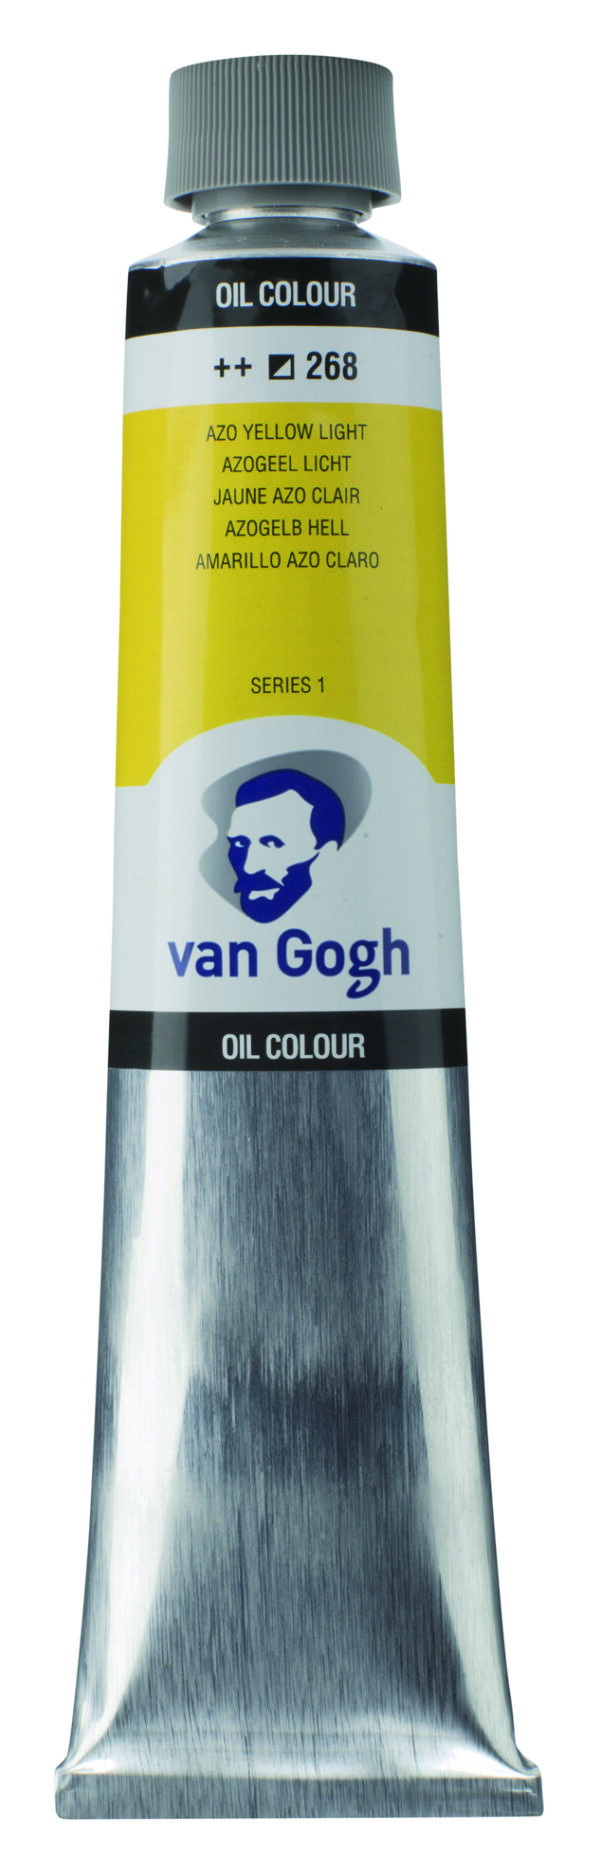 Van Gogh 268 Azo yellow Light - 200 ml